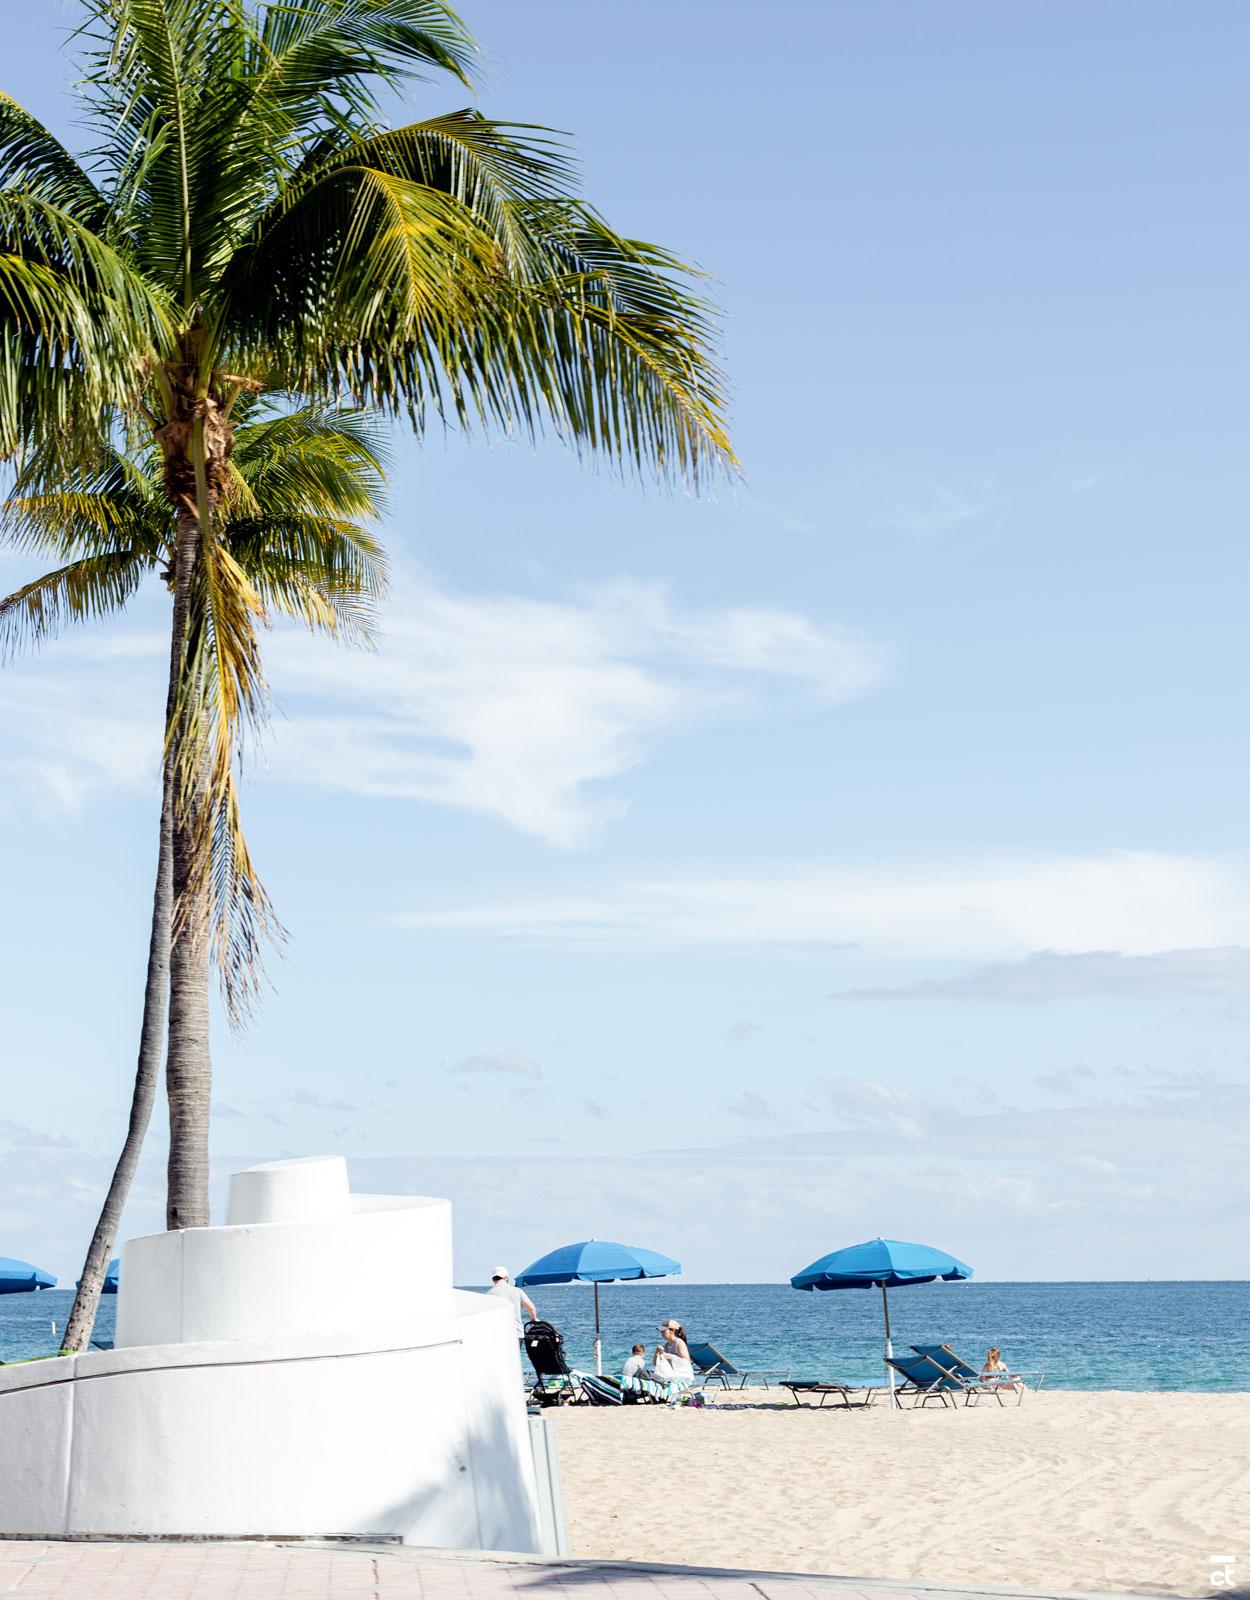 LAS OLAS BEACH - Fort Lauderdale Travel Guide: 25 Things to Do in Fort Lauderdale, Florida - CHRISTOBEL TRAVEL